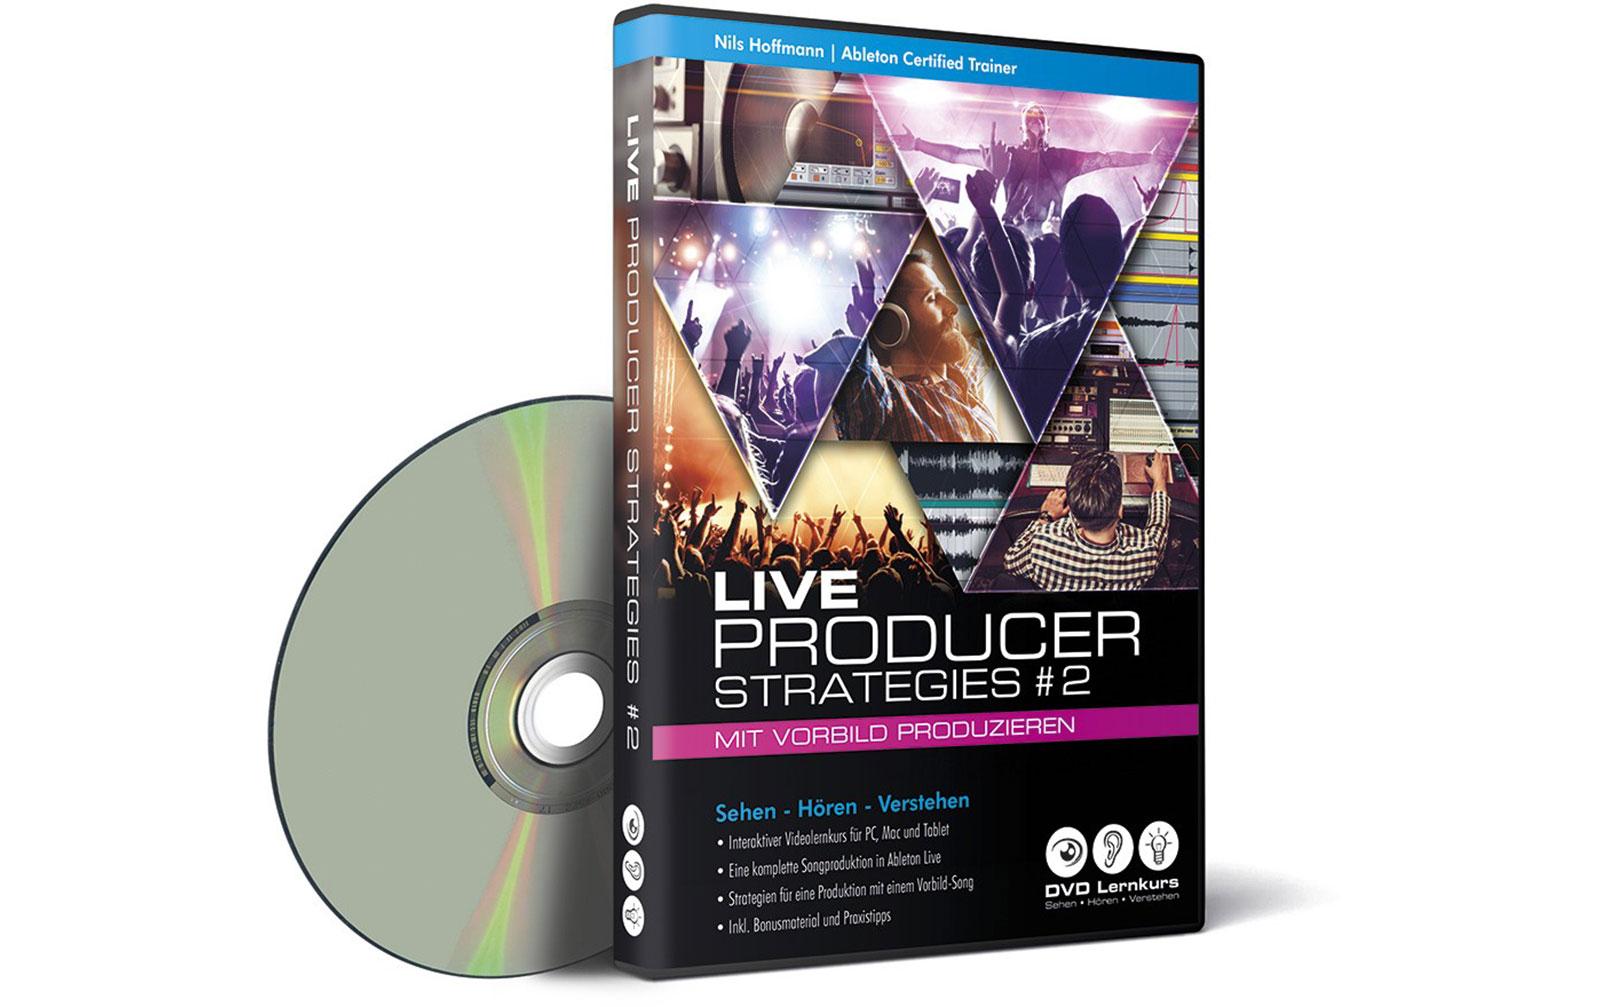 dvd-lernkurs-ableton-live-producer-strategies-2